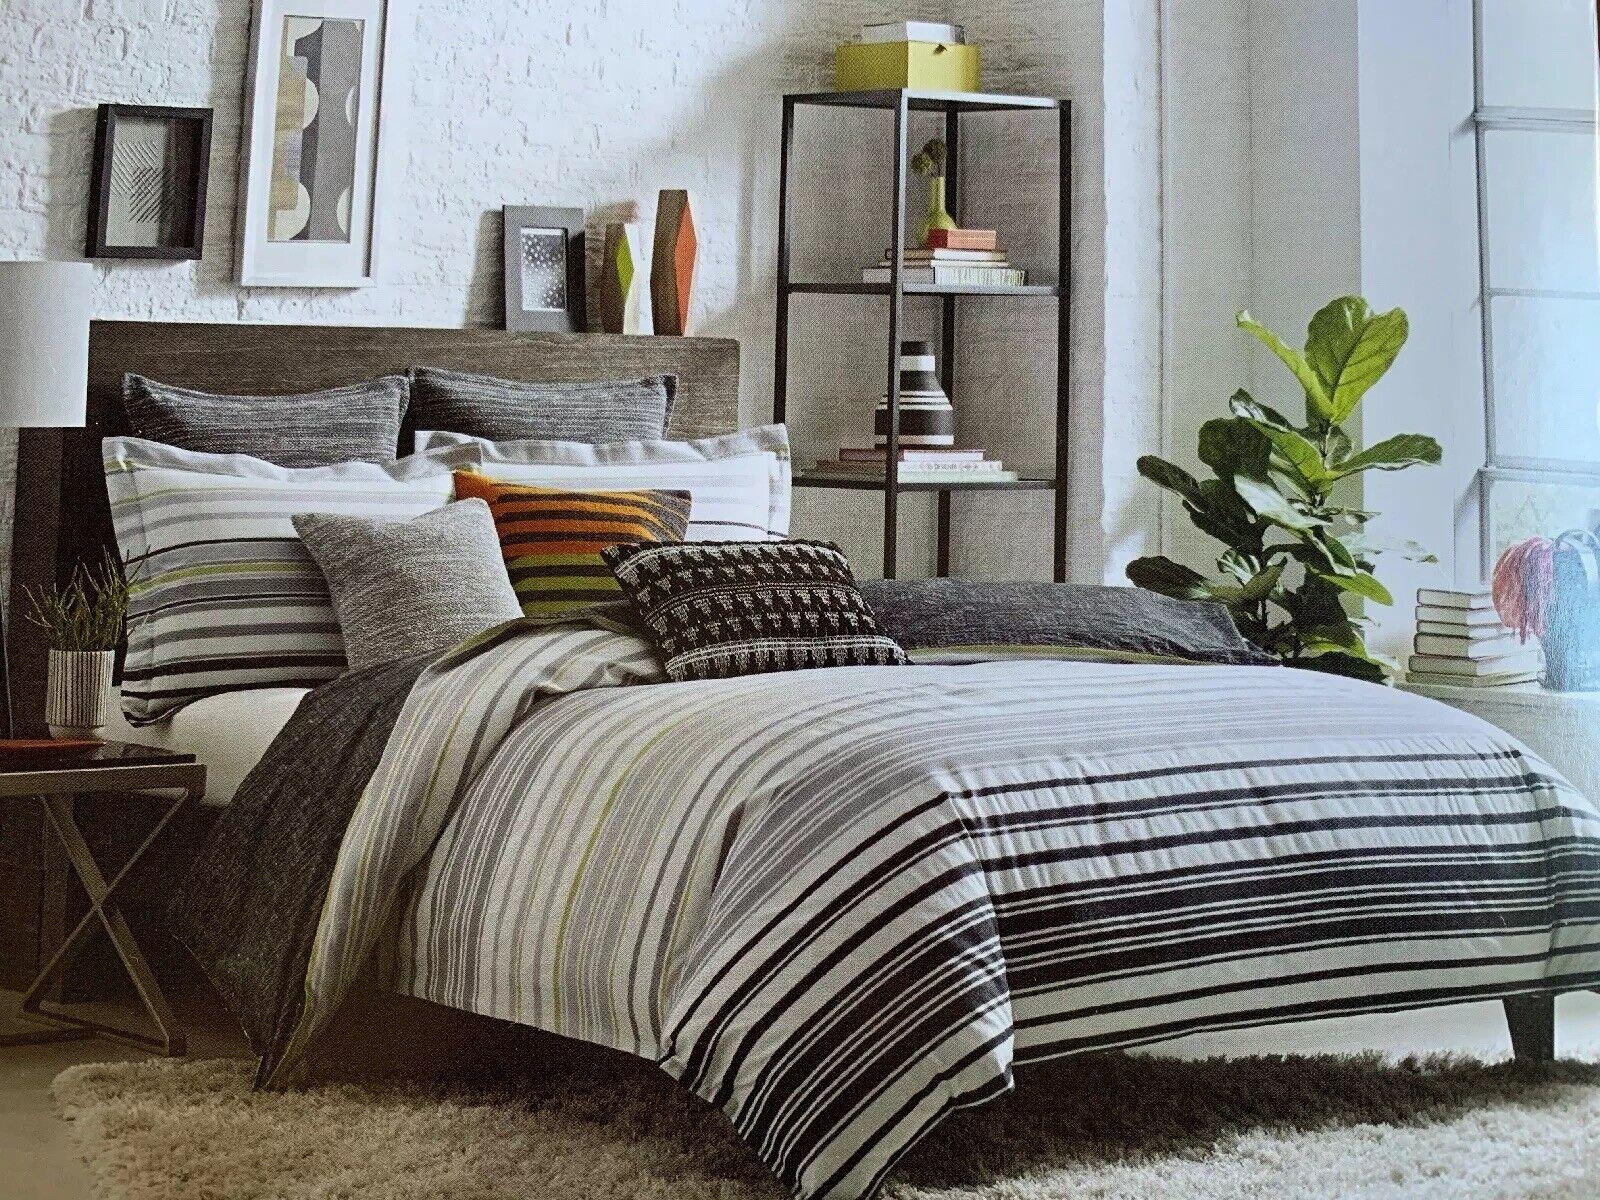 KAS Room Arlo King Duvet Cover Cotton Stripes Gray White Green New